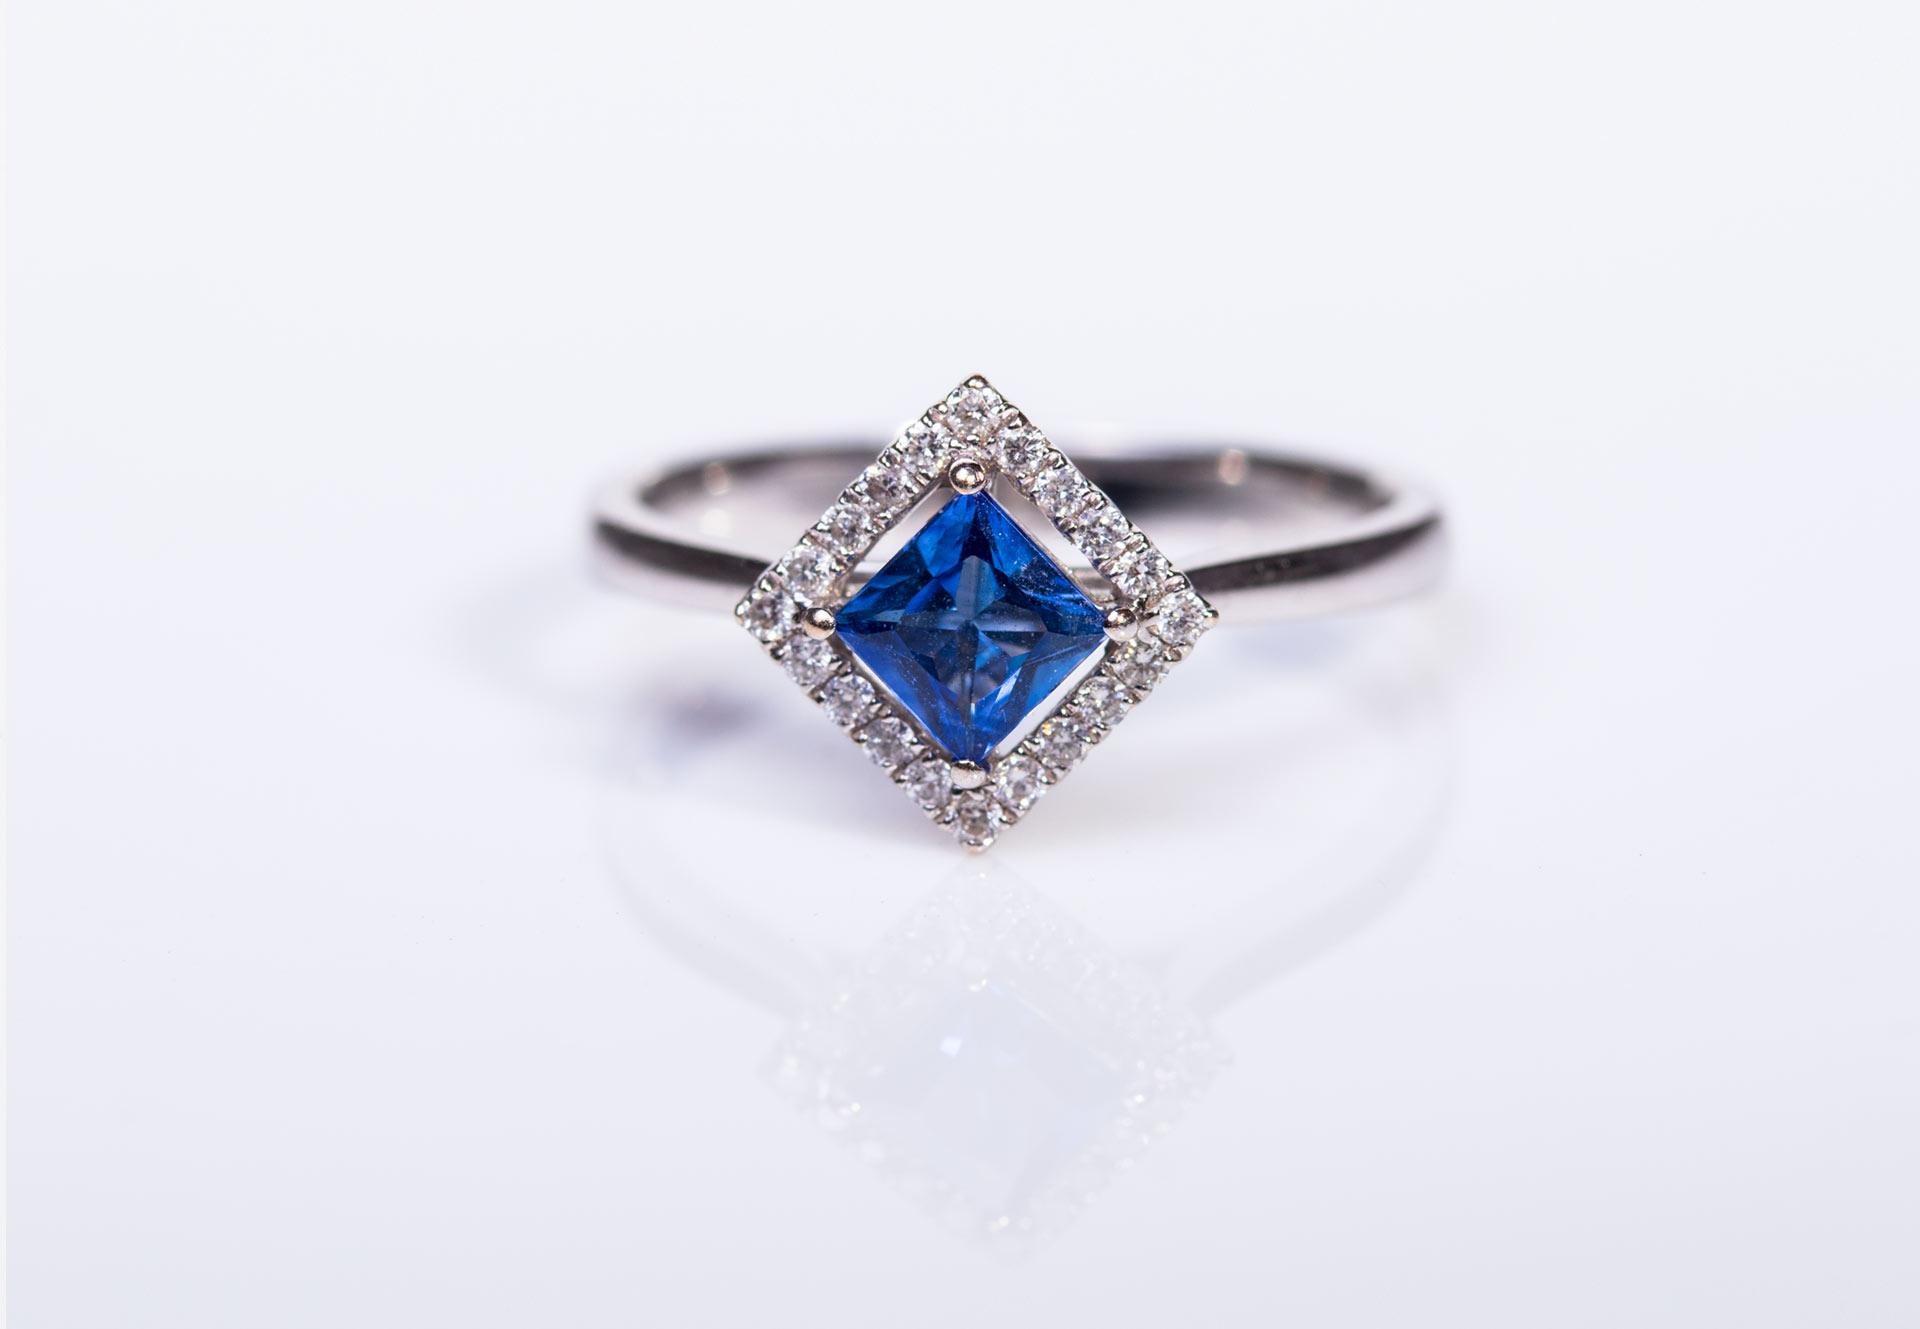 kinver jewellers - handmade bespoke jewellery & watch repairs